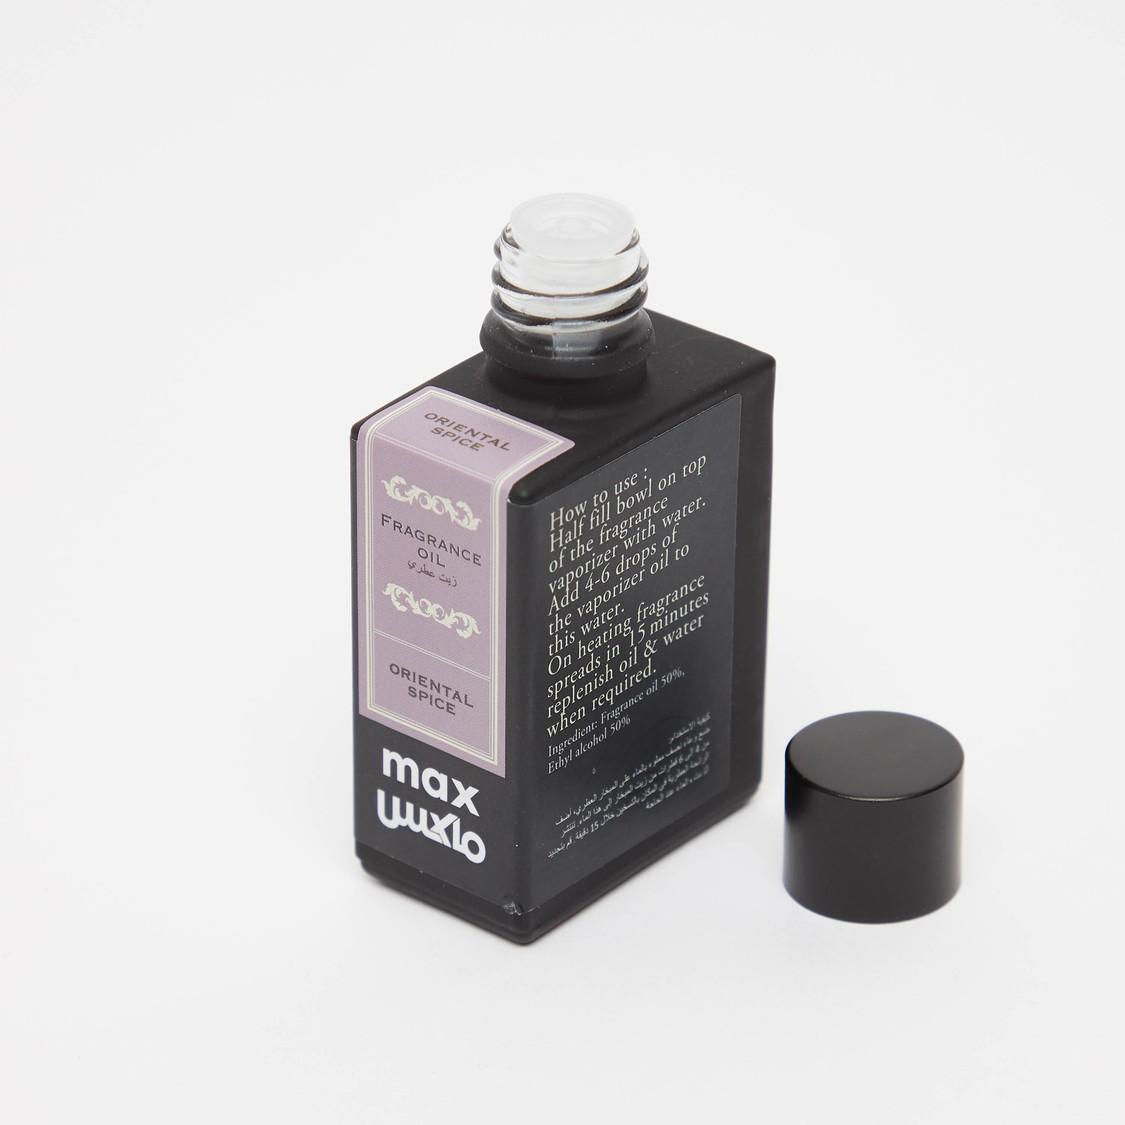 Oriental Spice Fragrance Oil